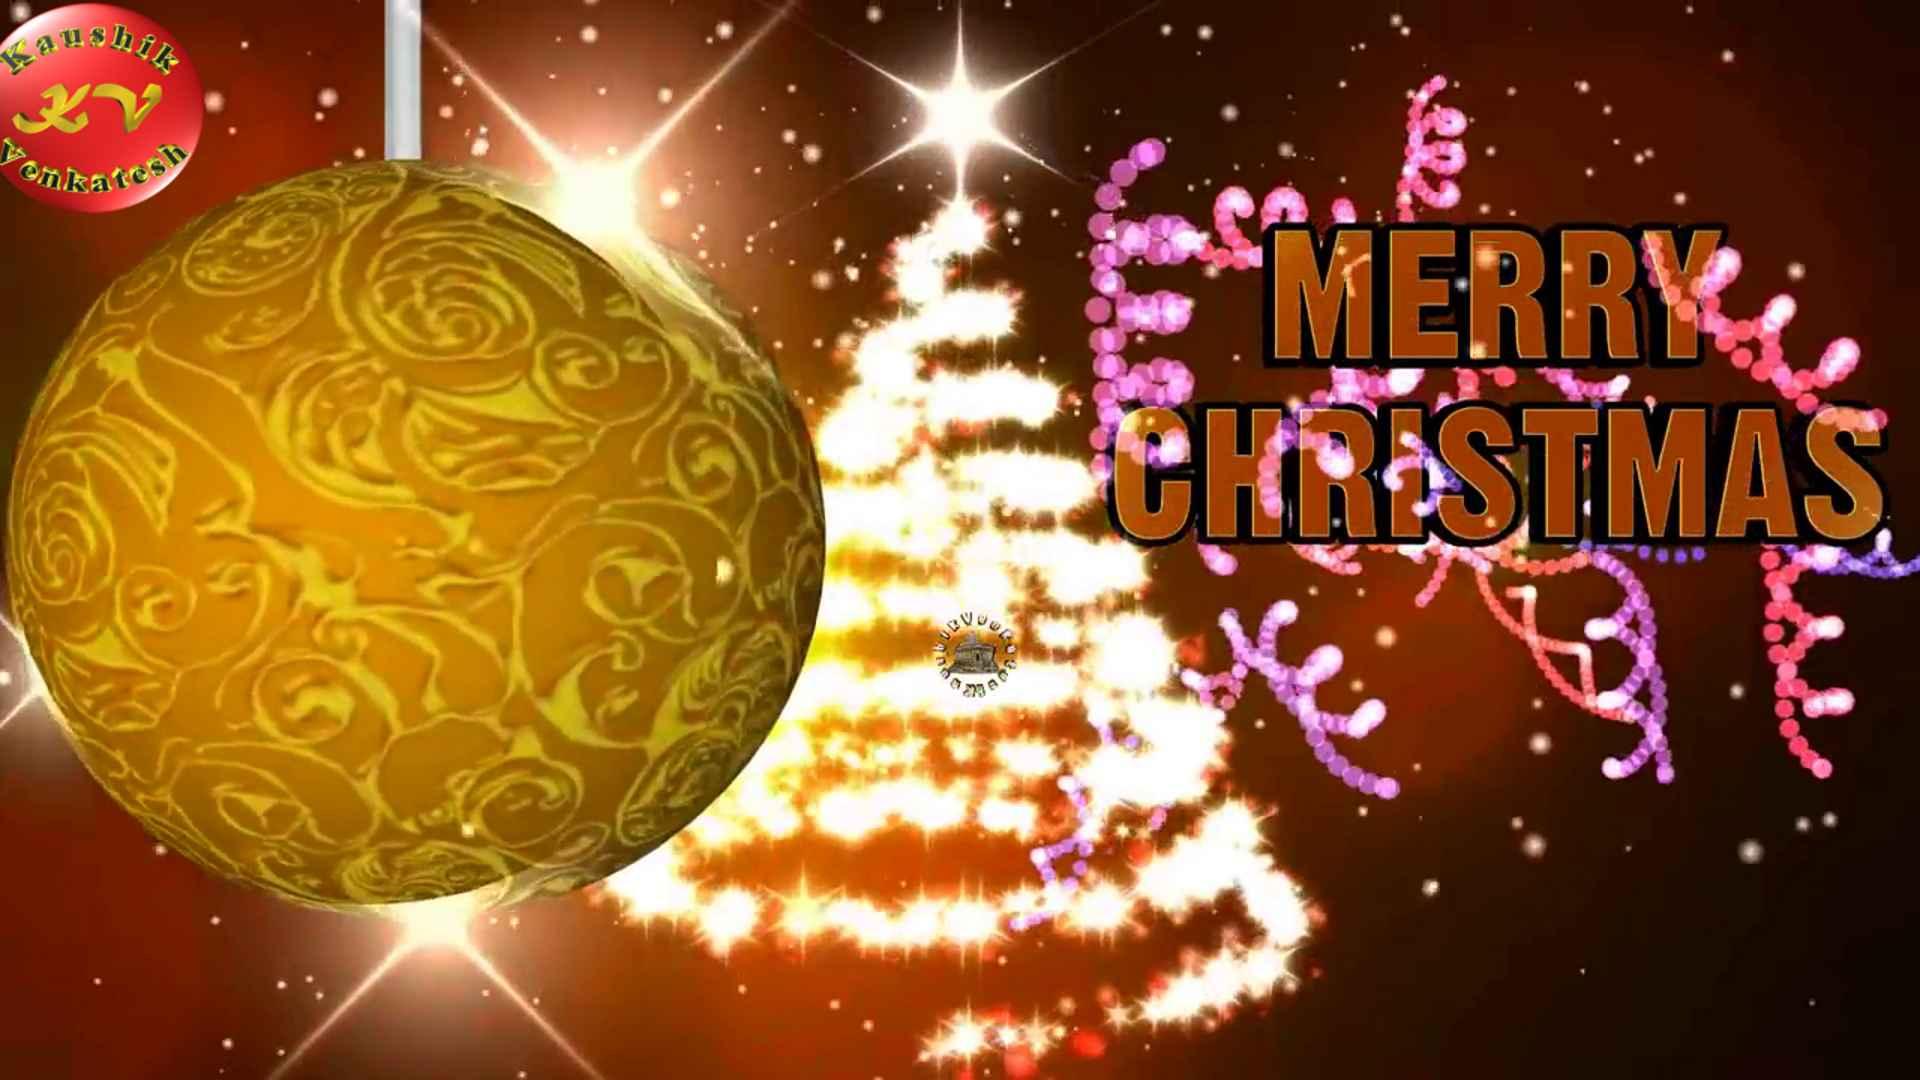 Christmas Video Greetings